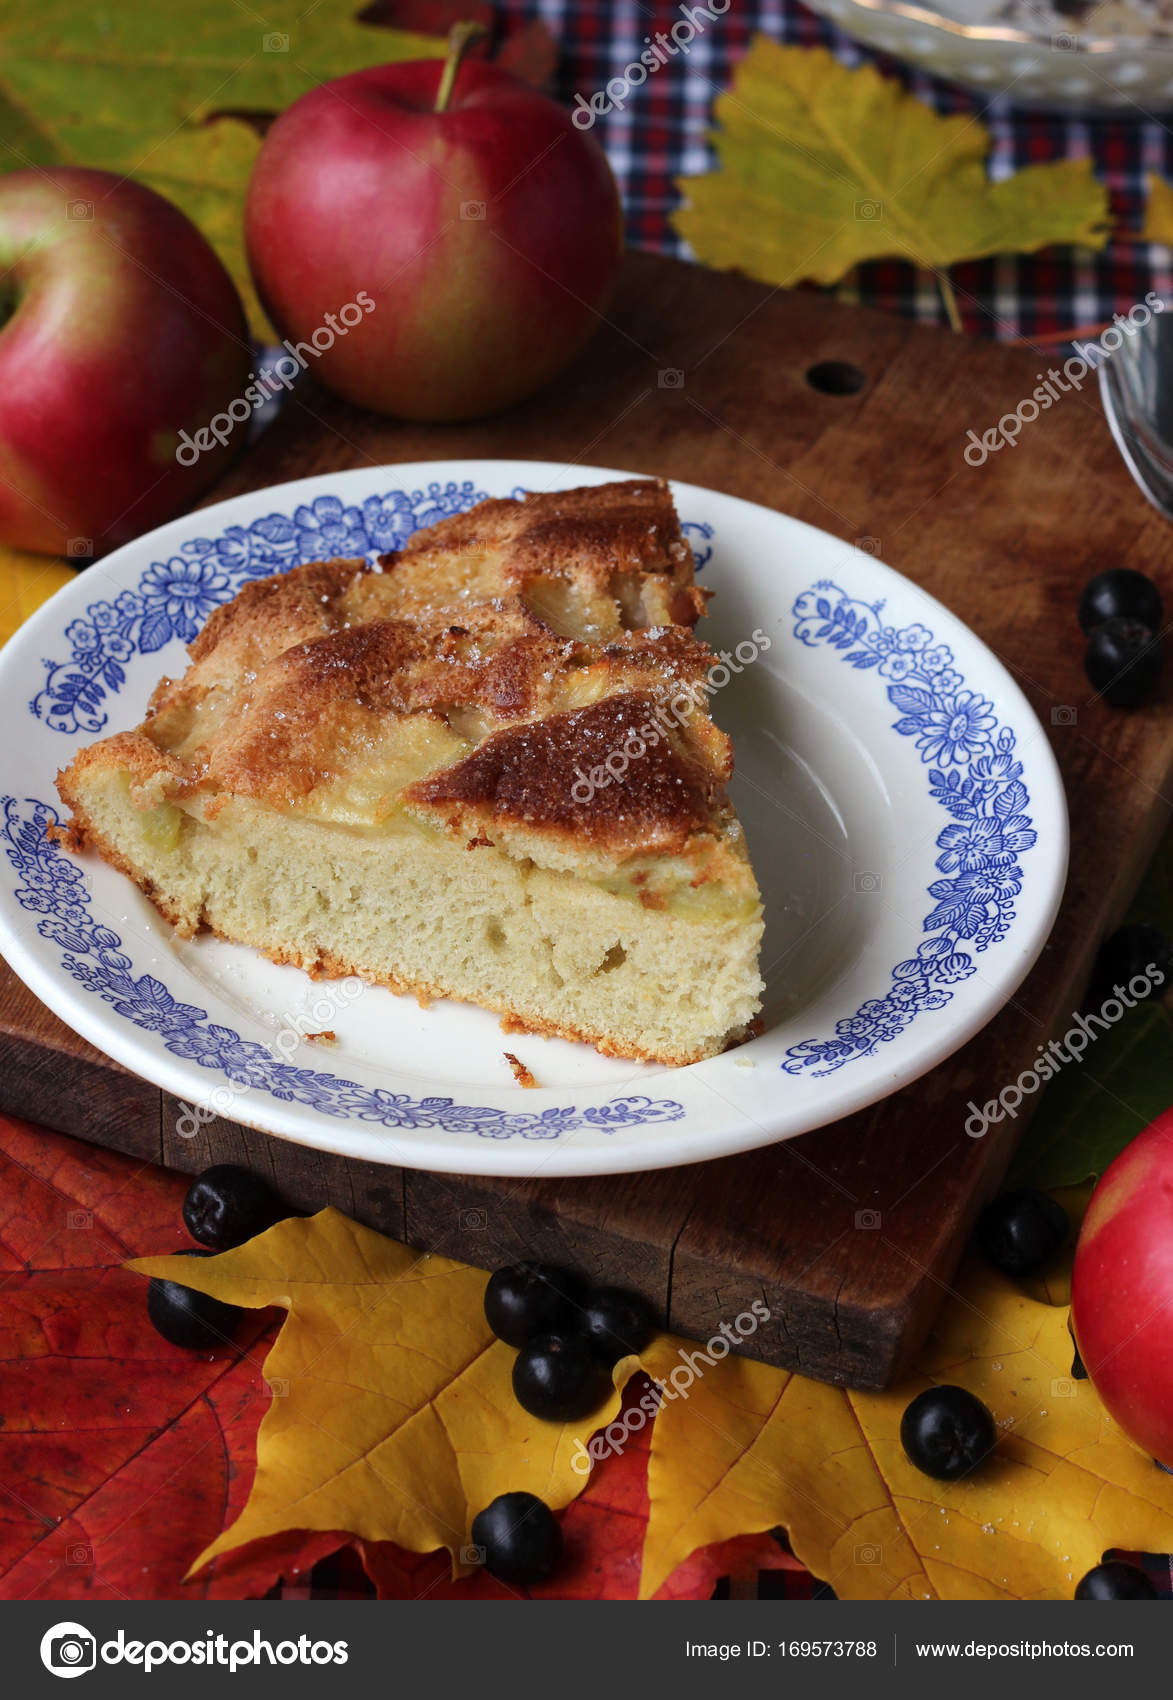 Muz ve elma ile lezzetli charlotte